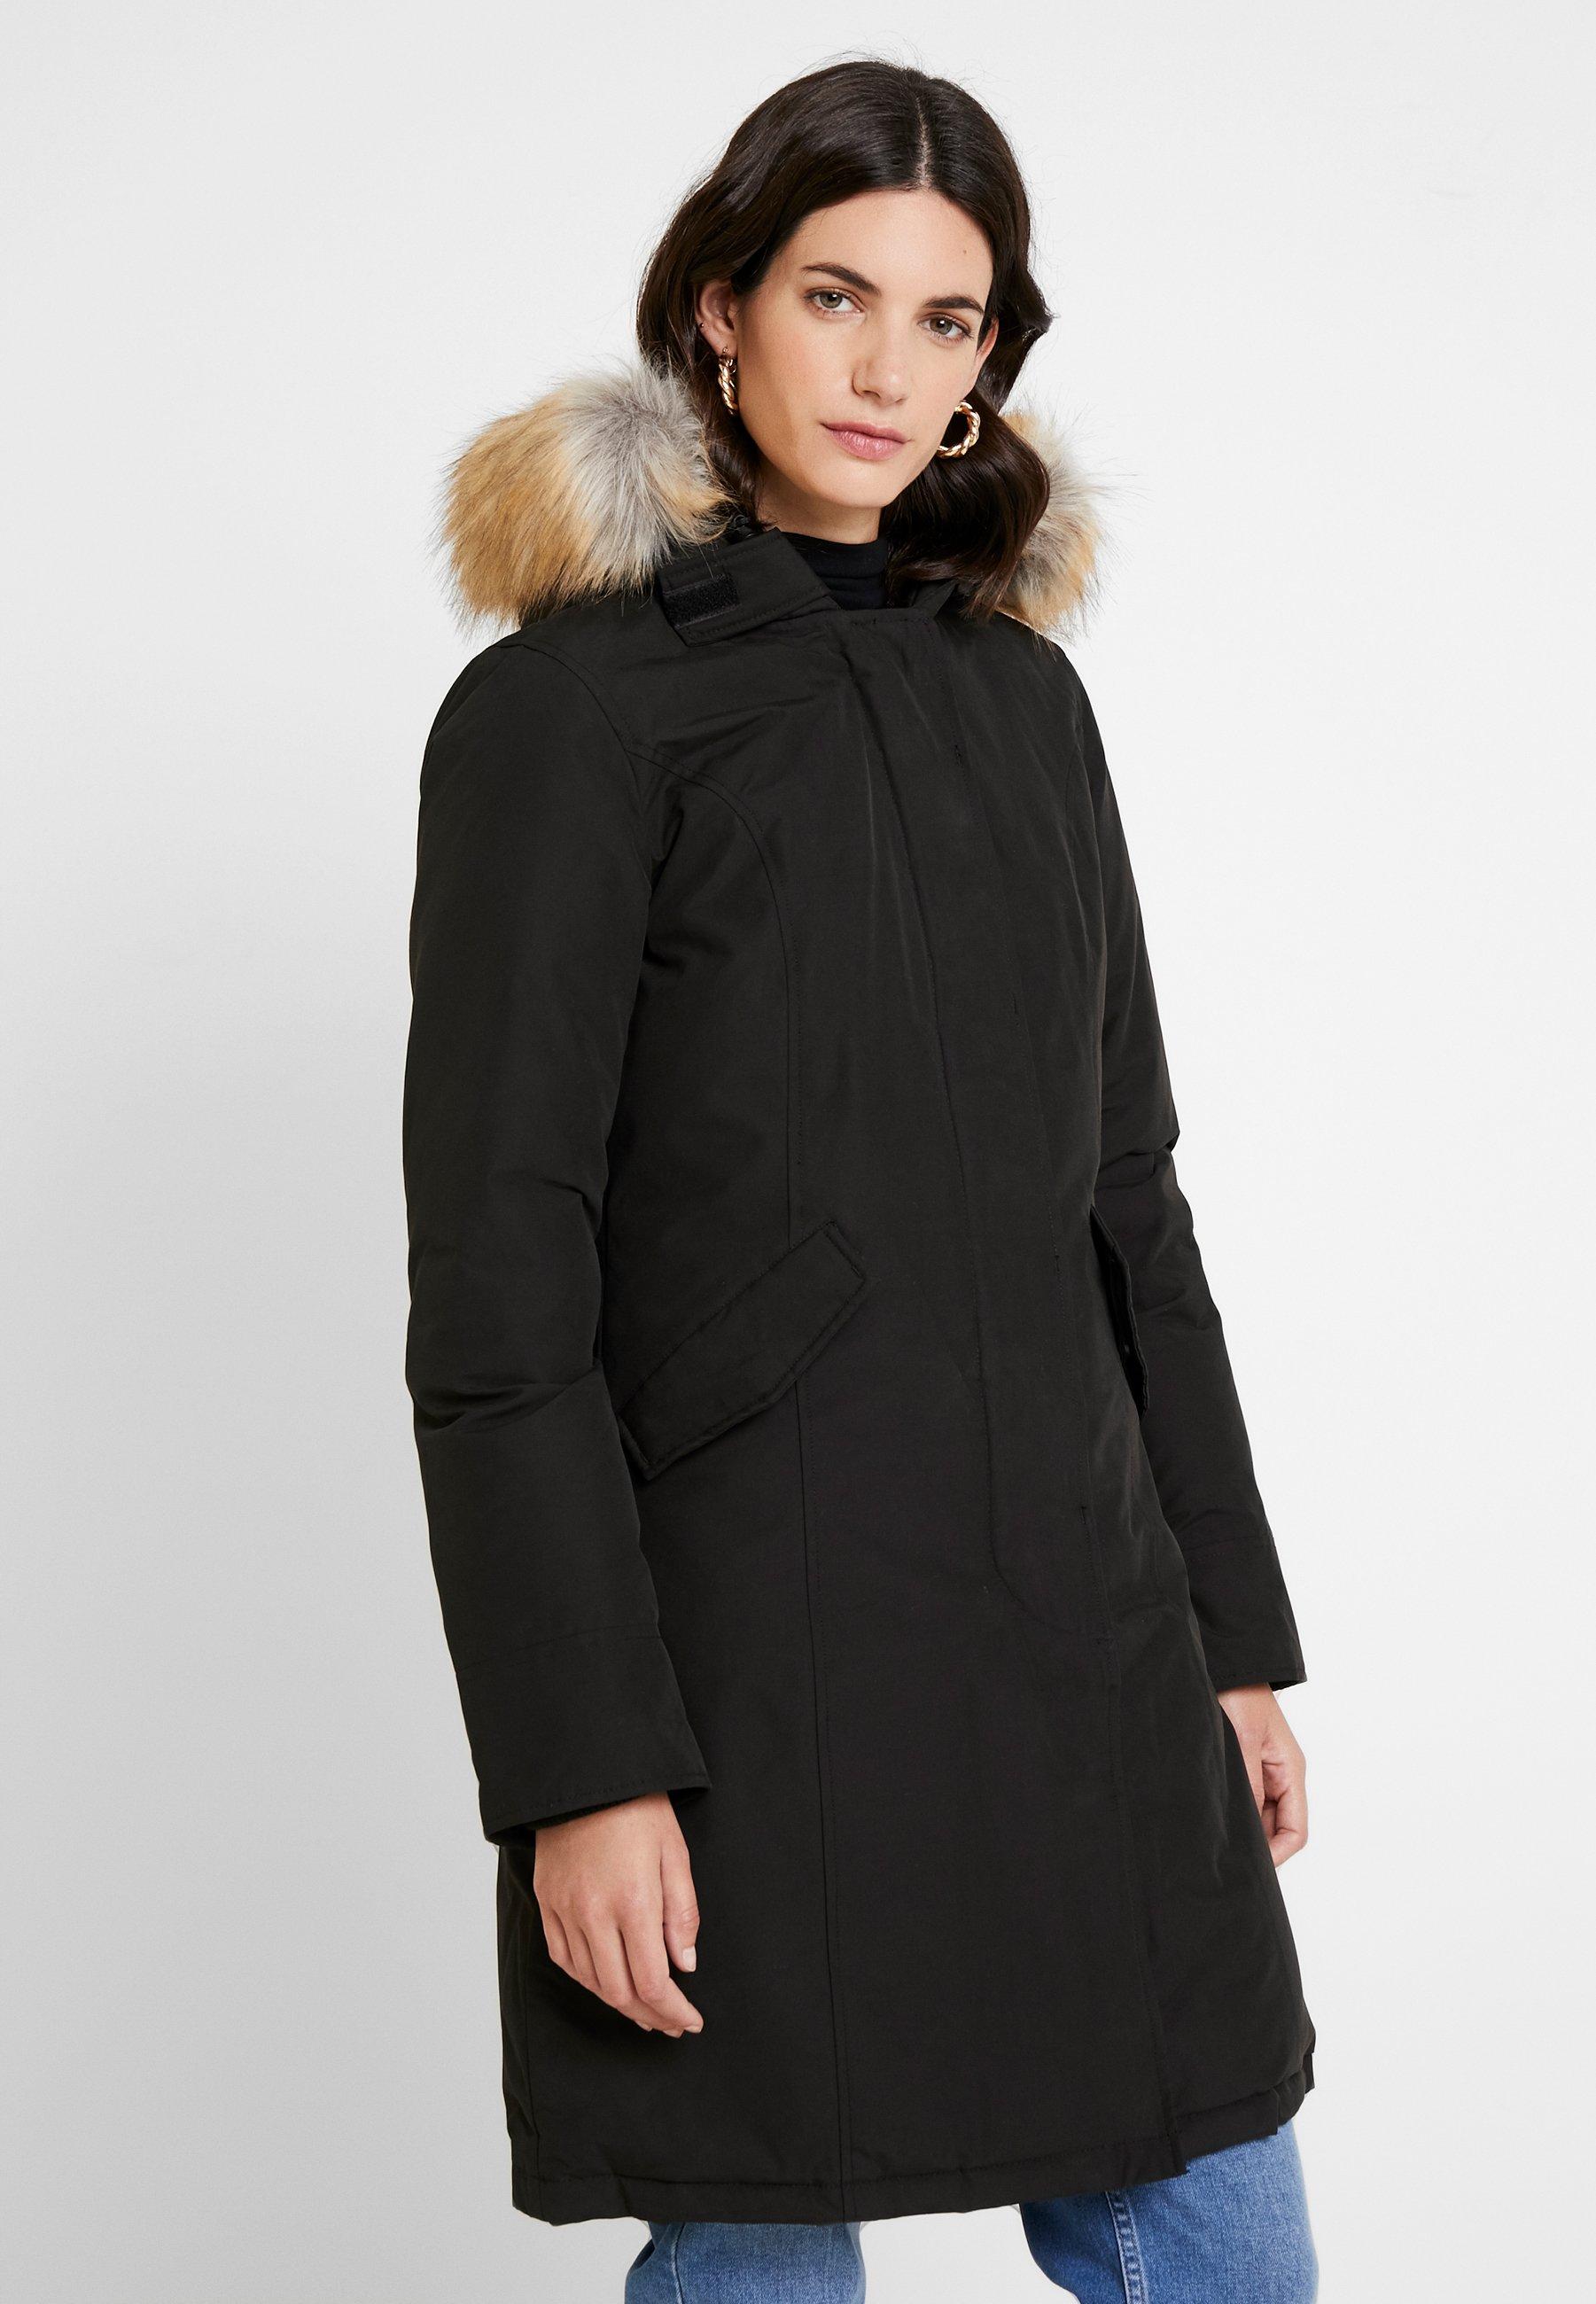 Canadian Classics Fundy Bay Long Fake Fur Donsjas Black Zwart Zalando Nl